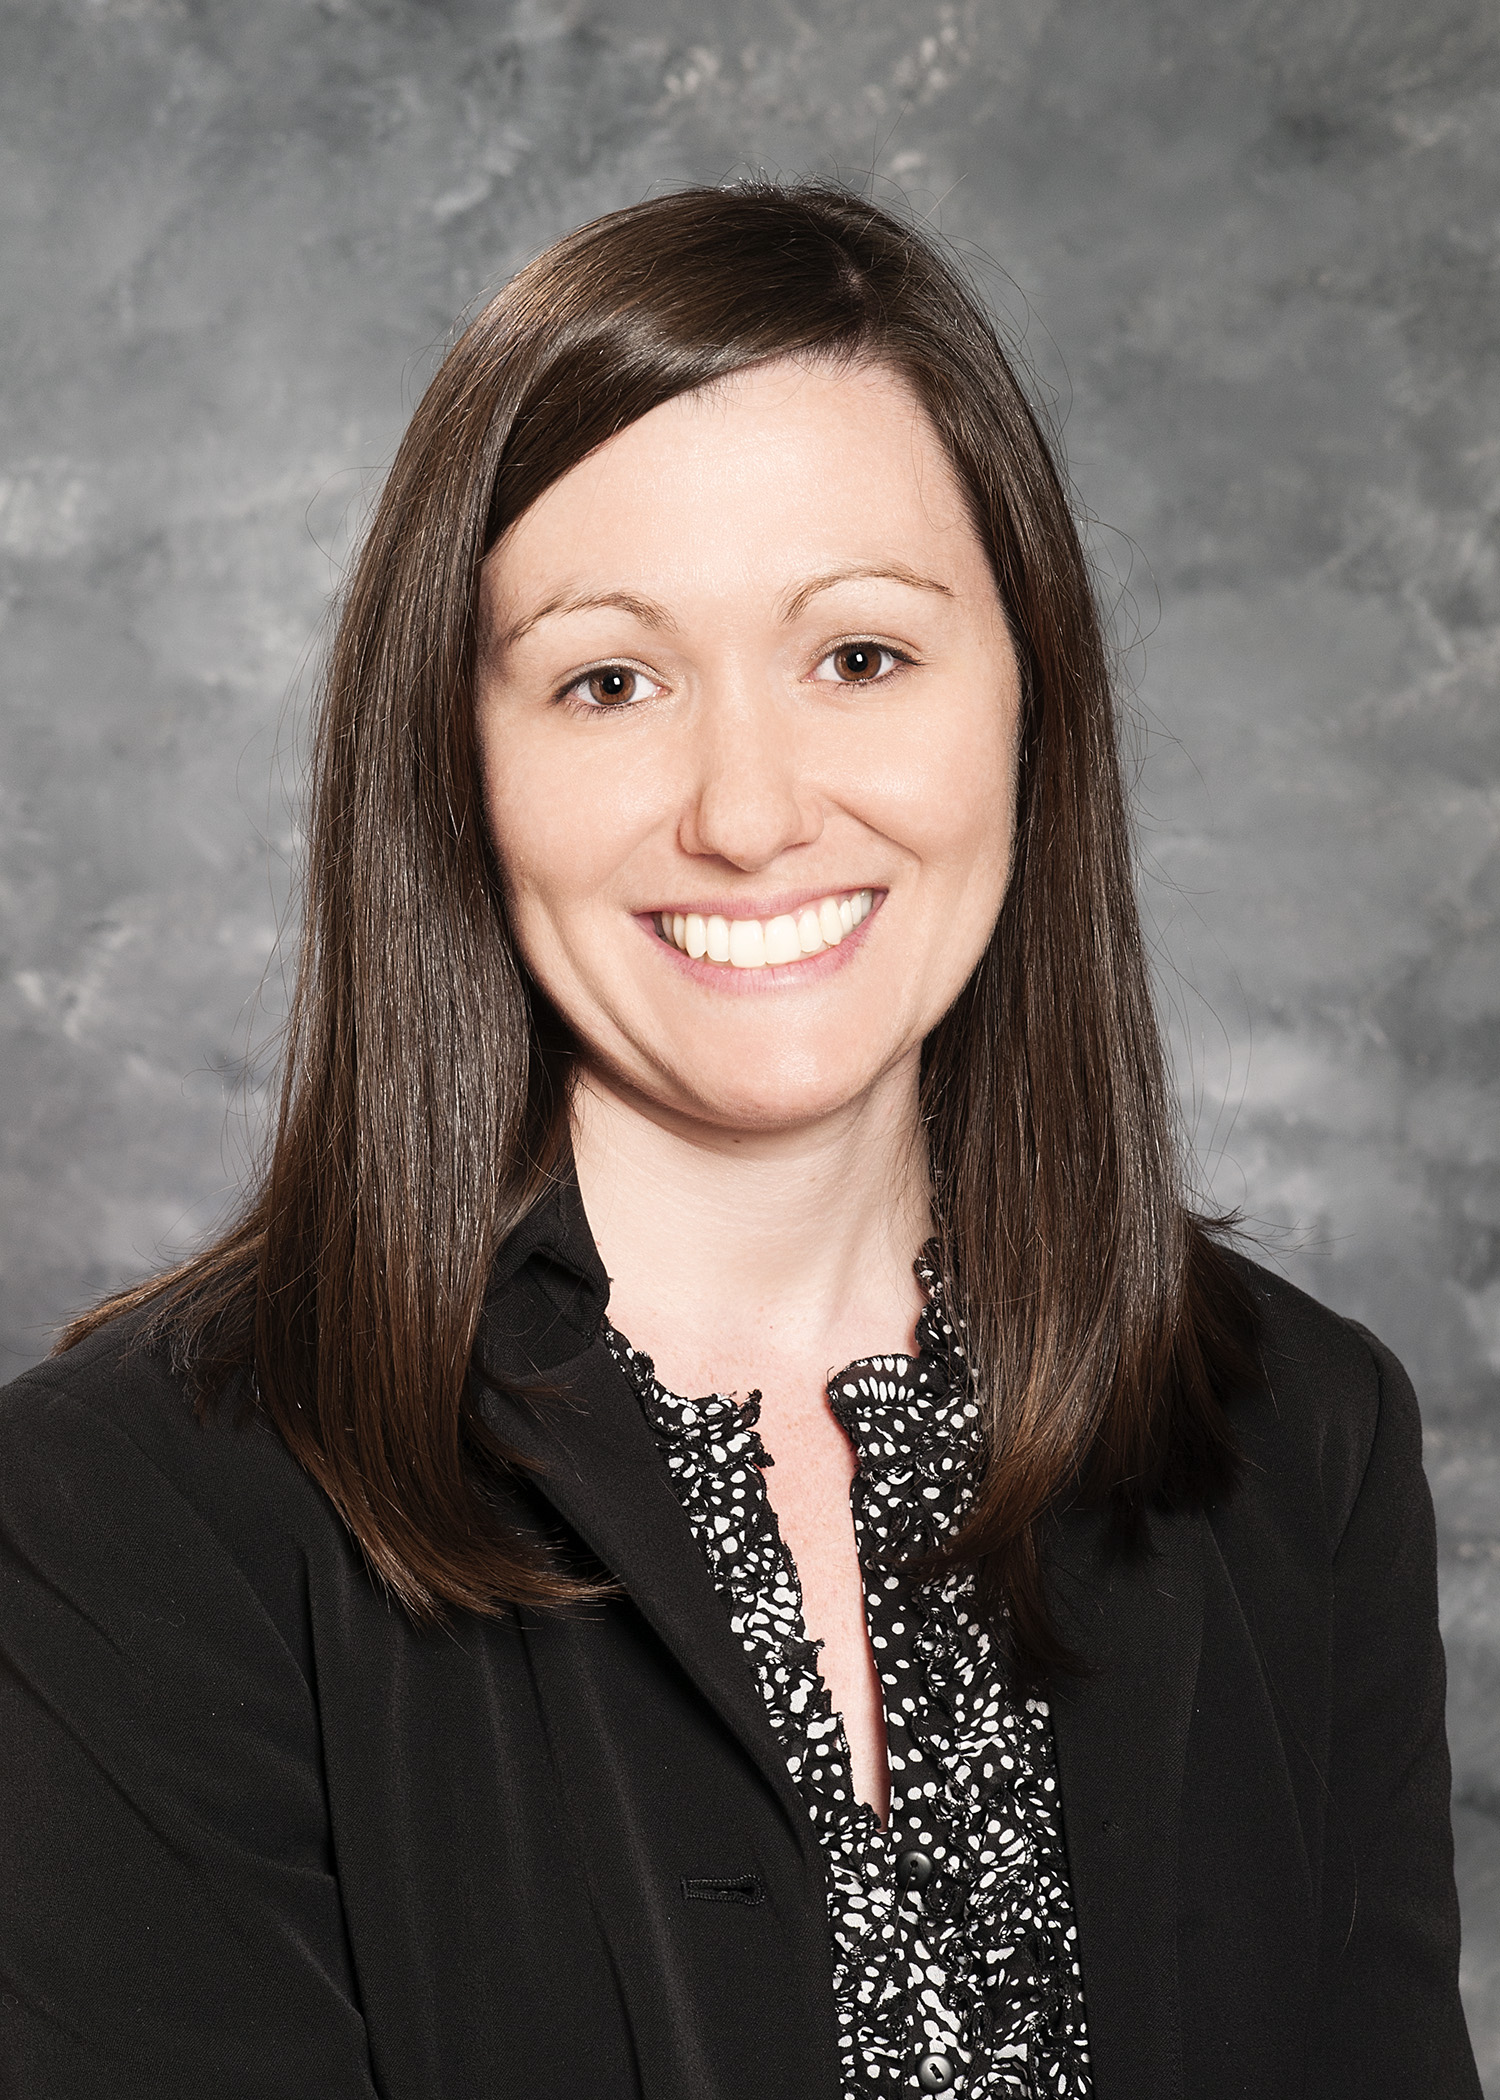 Camille Schwarzrock, MSN, CNP, National Brain Aneurysm & Tumor Center, St. Paul, Minnesota